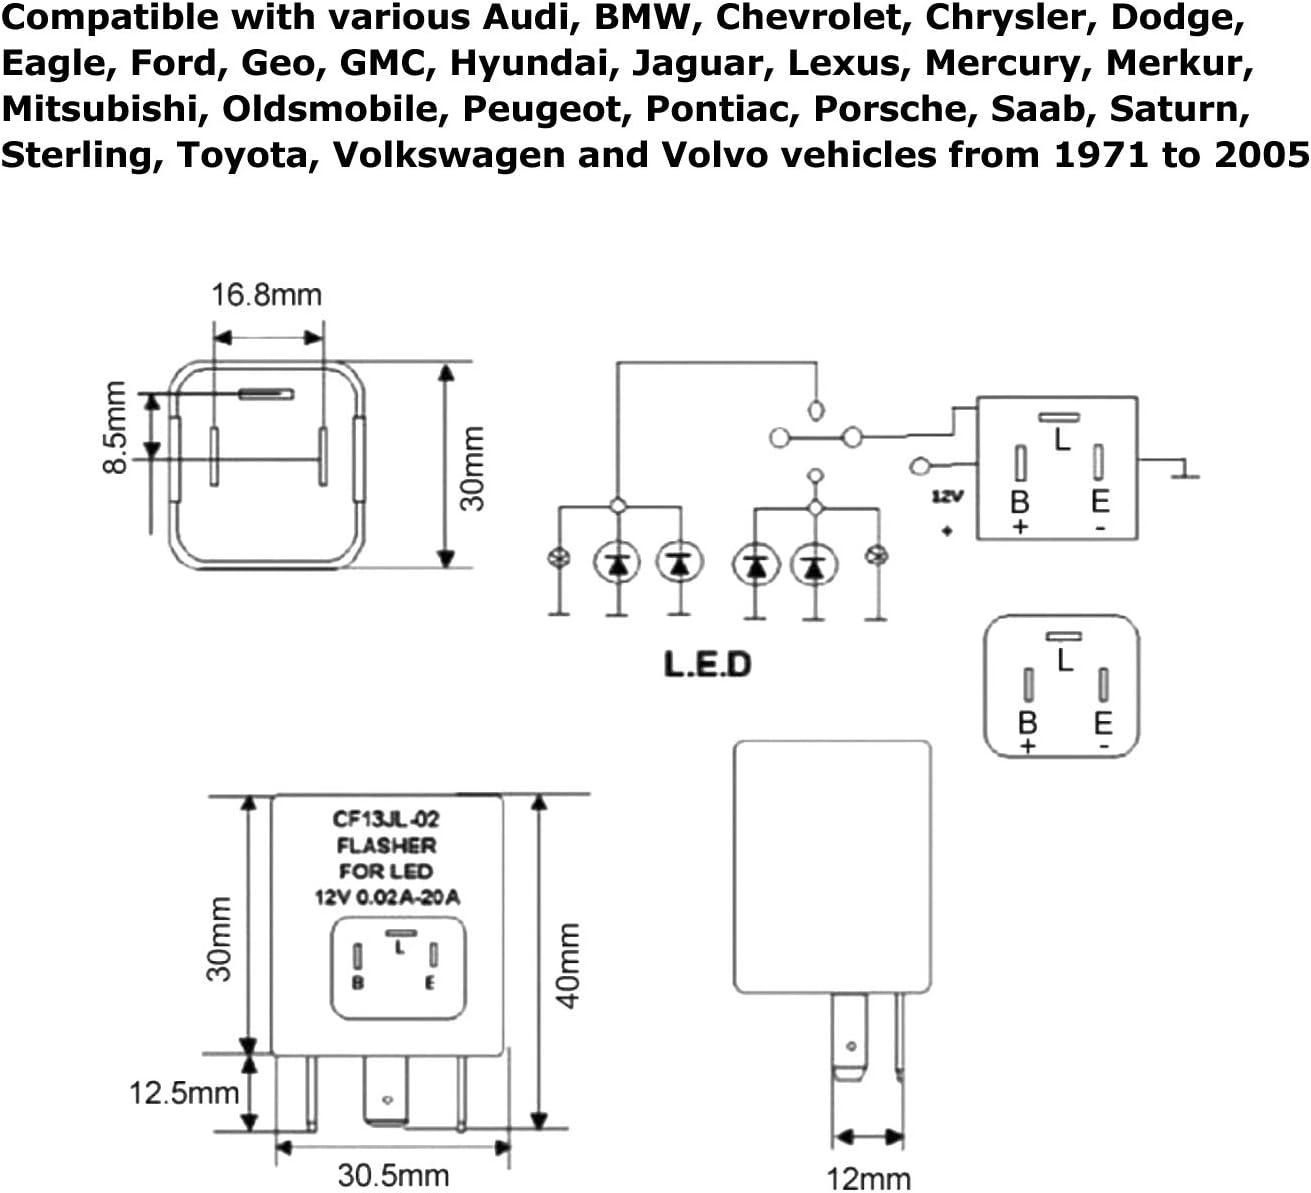 sterling truck turn signal wiring diagram amazon com ijdmtoy  1  3 pin cf 13 cf13 ep34 electronic flasher  cf13 ep34 electronic flasher